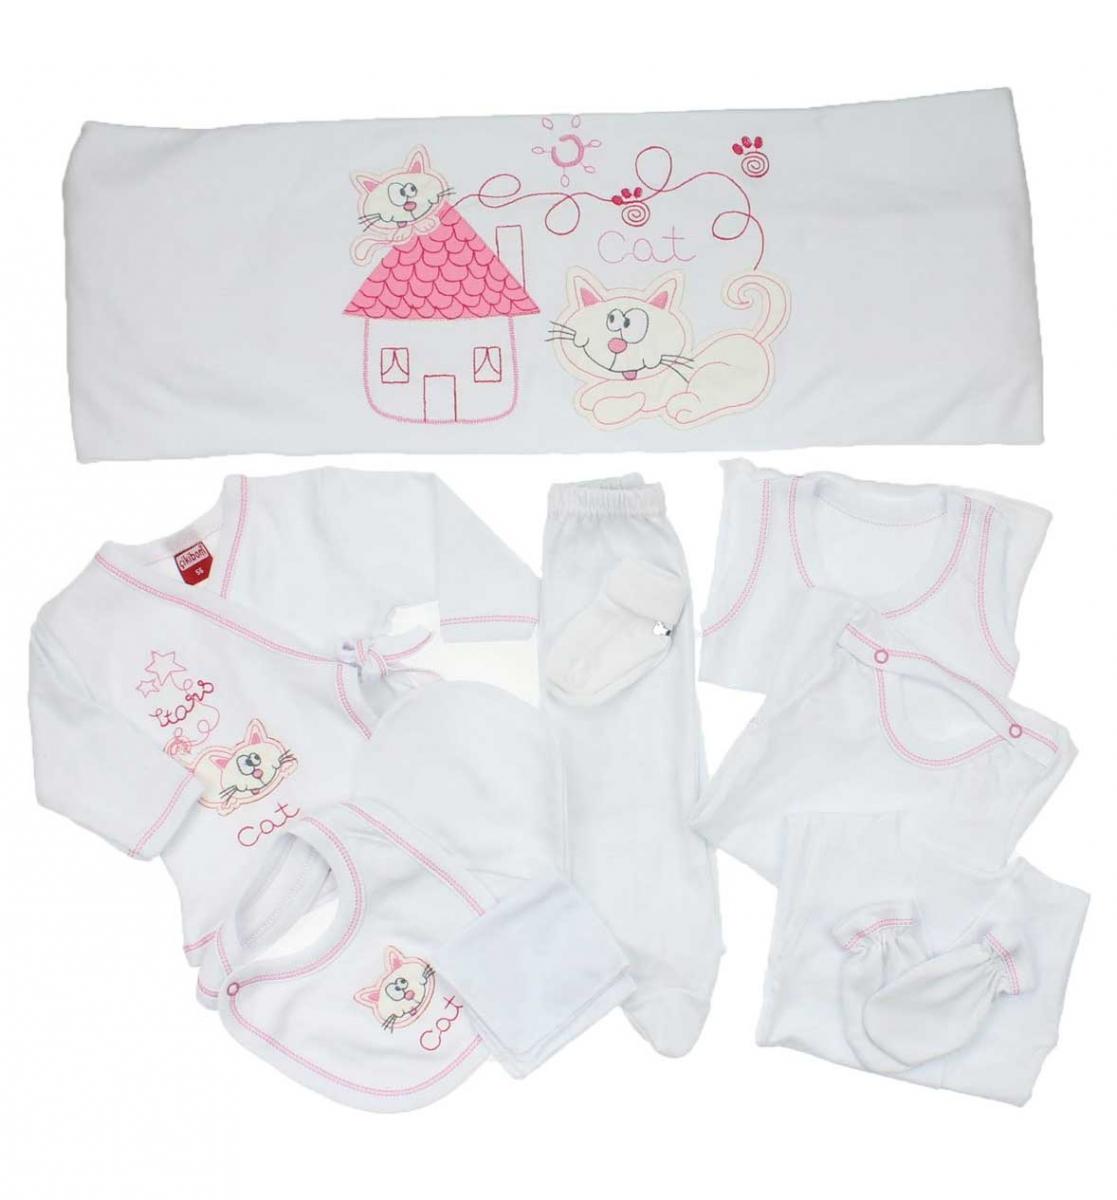 Çikibom Kız Bebek Kedili 11 li Hastane Çıkışı 019-6050-021